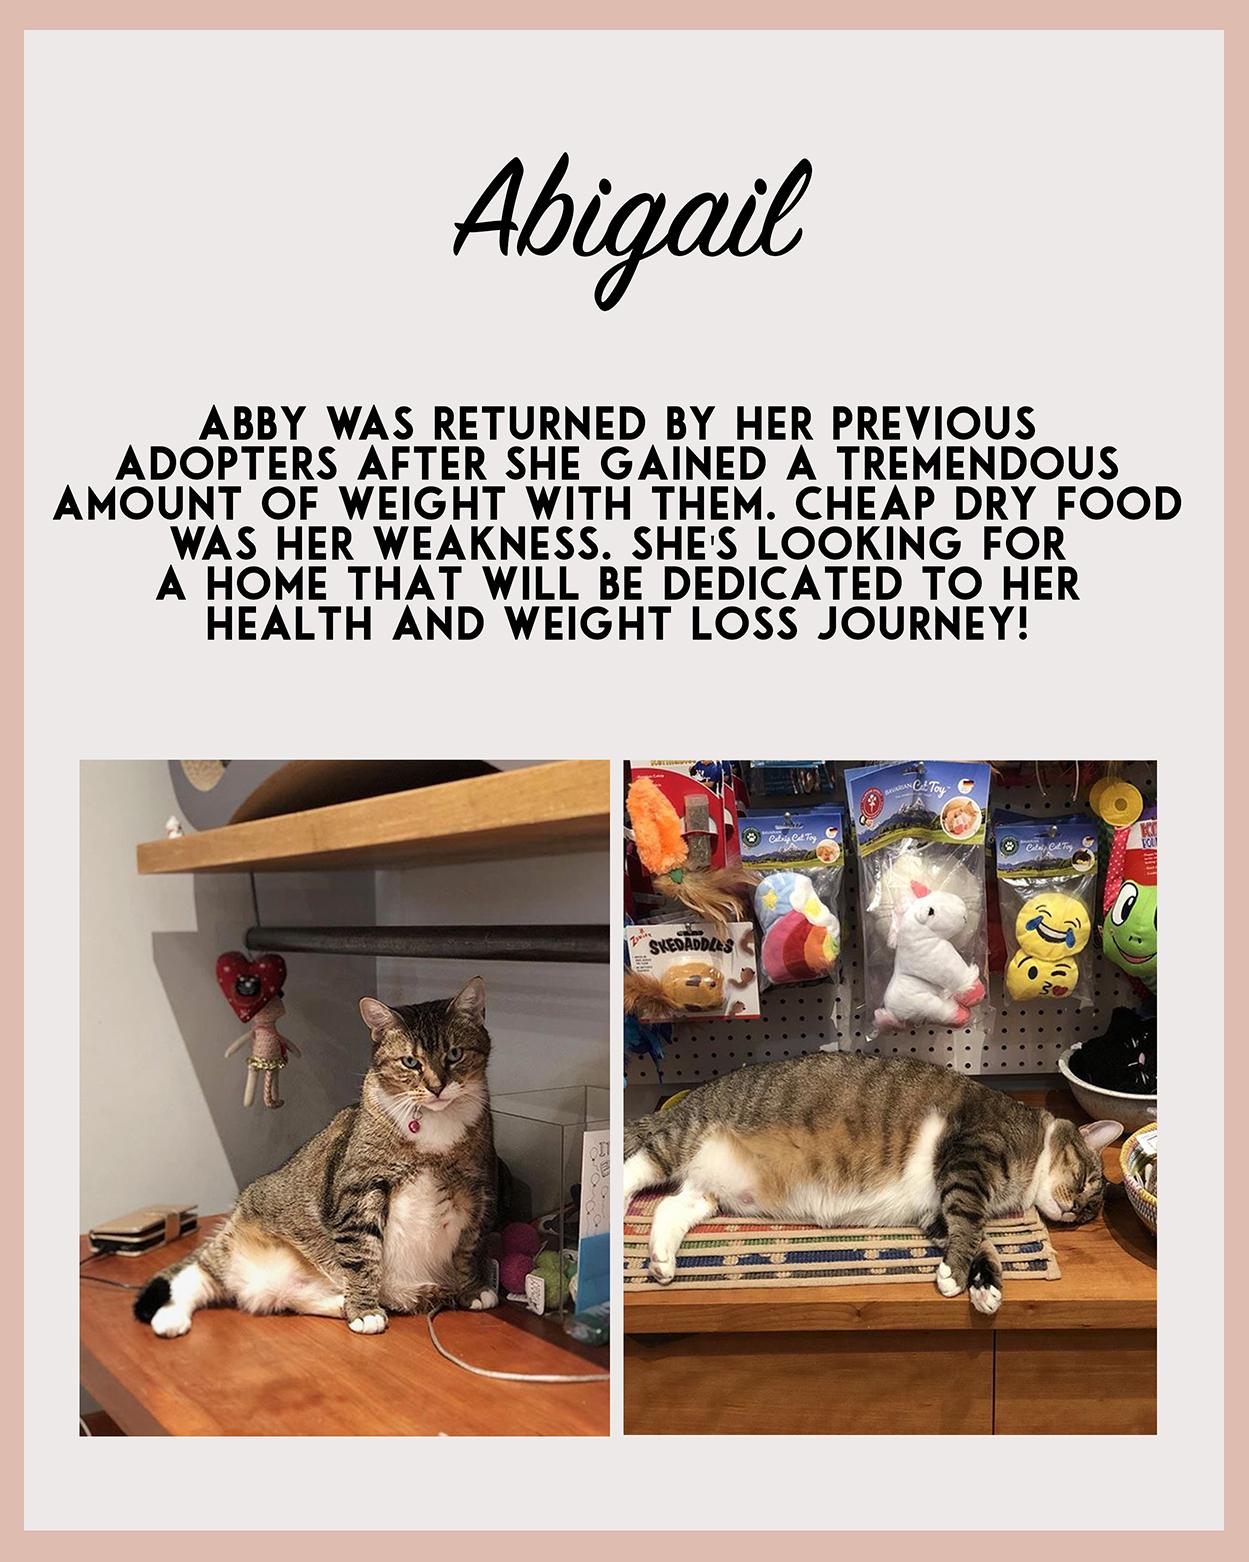 Adopt Abigail.